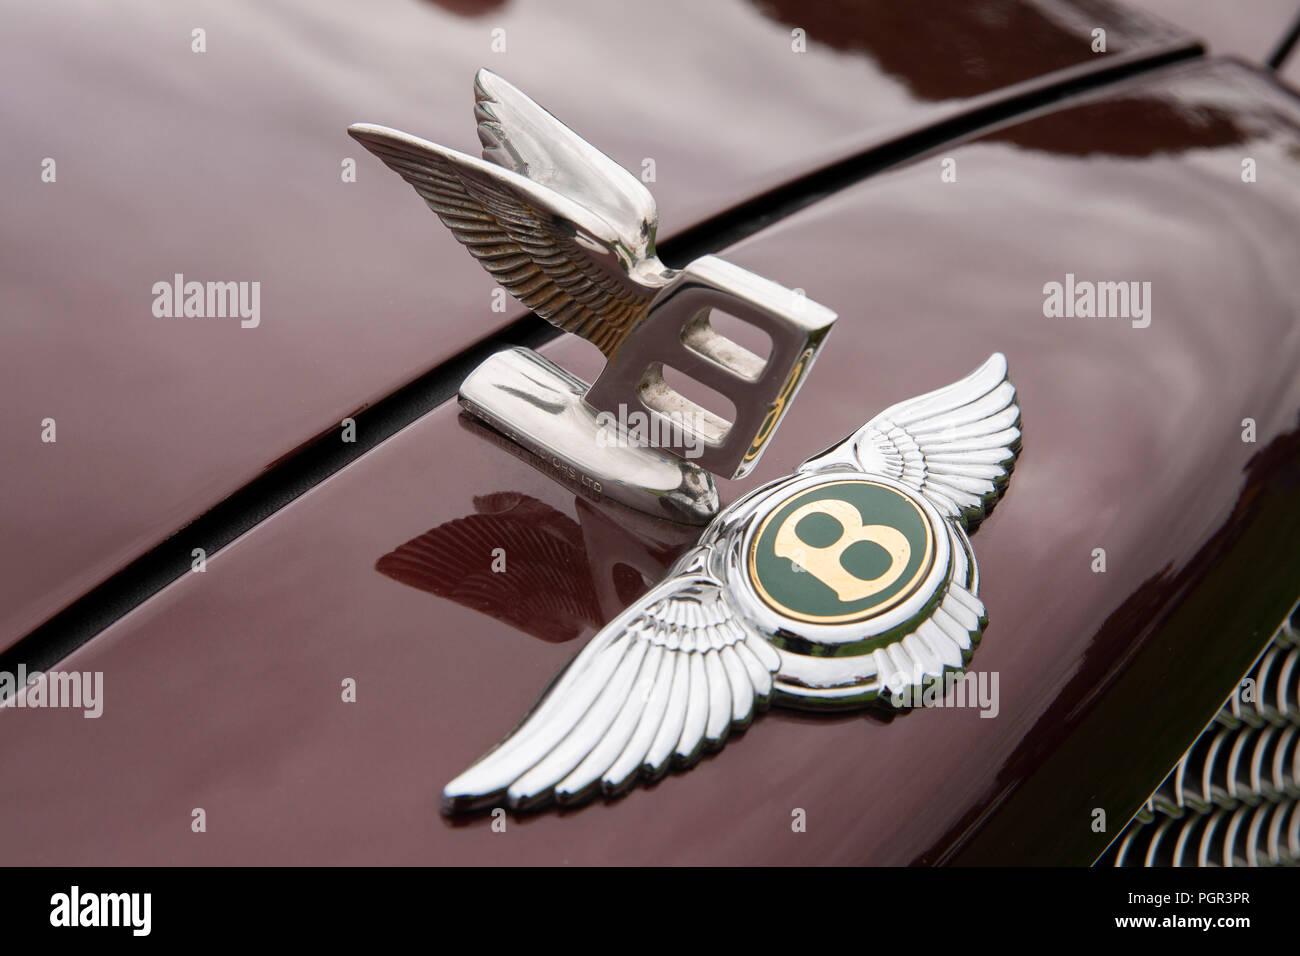 UK, England, Cheshire, Stockport, Woodsmoor Car Show, flying B badges on radiator of 1999 Bentley Arnage saloon car Stock Photo